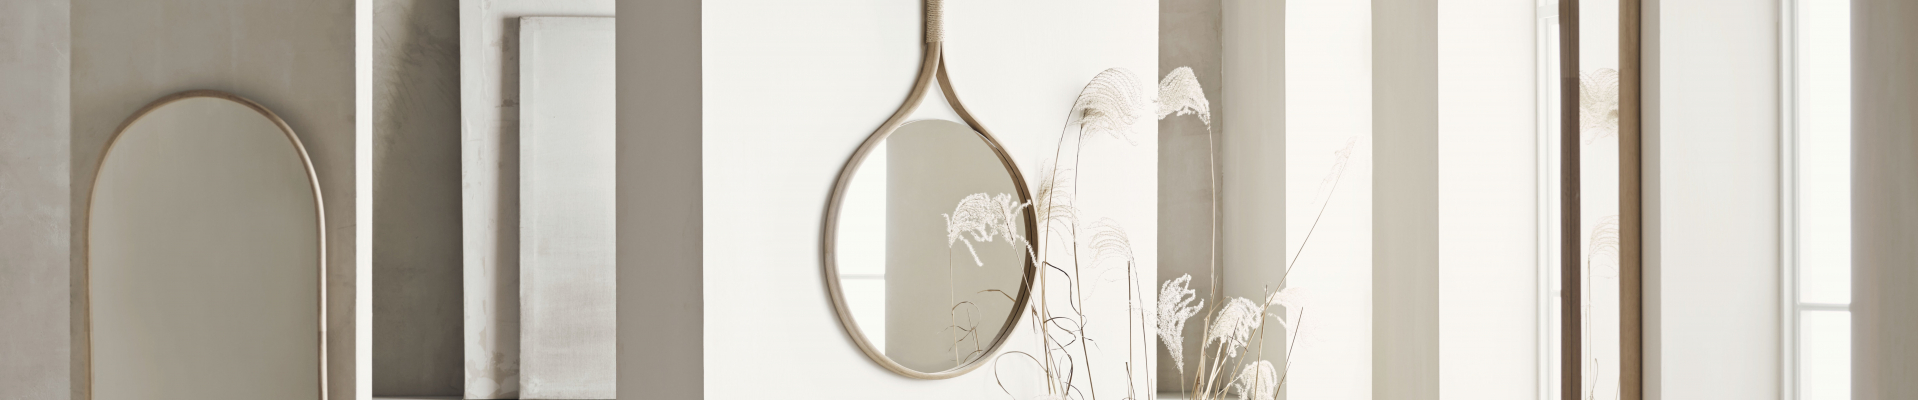 Bolia spiegels